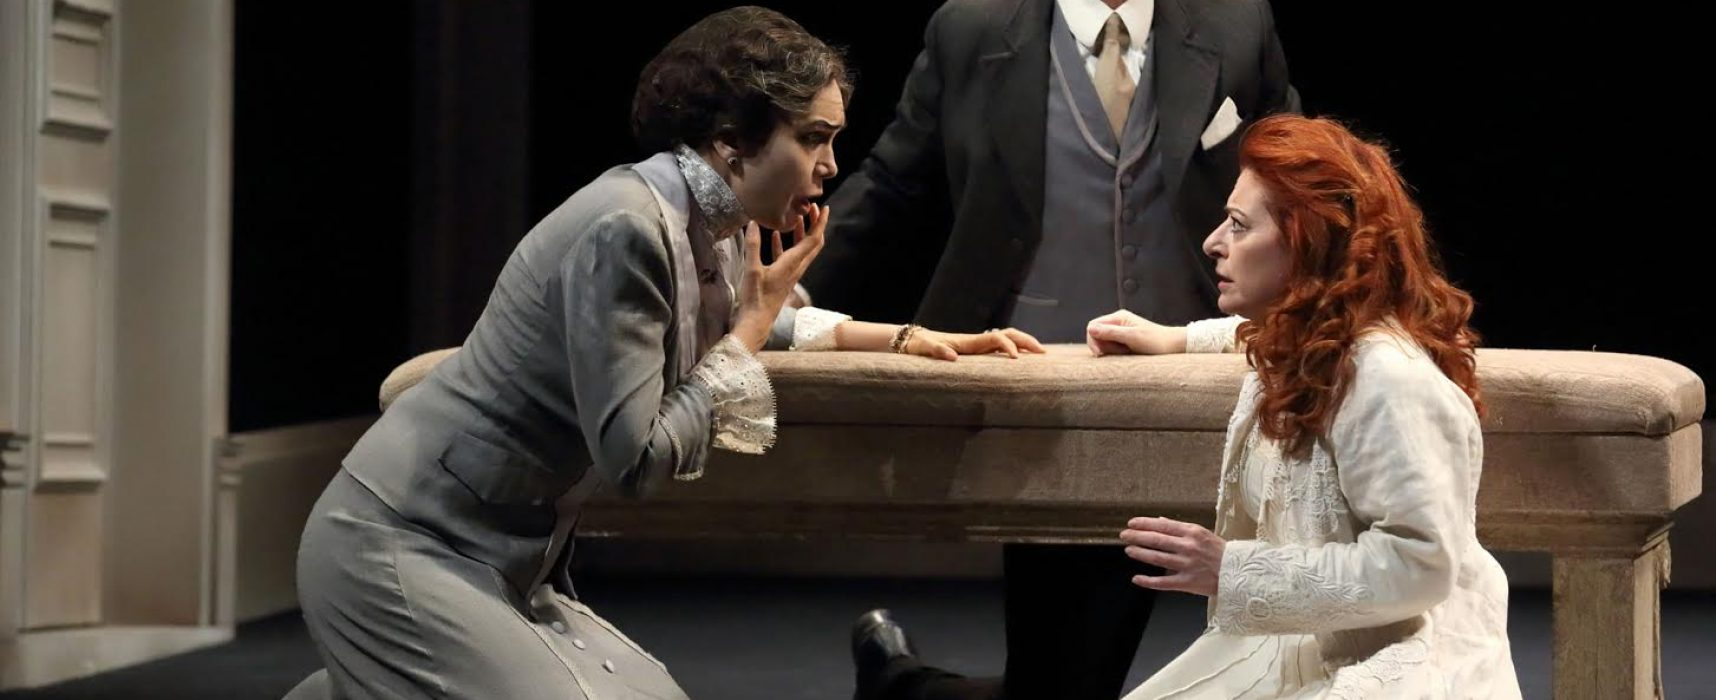 Teatro, Pirandello al Mercadante